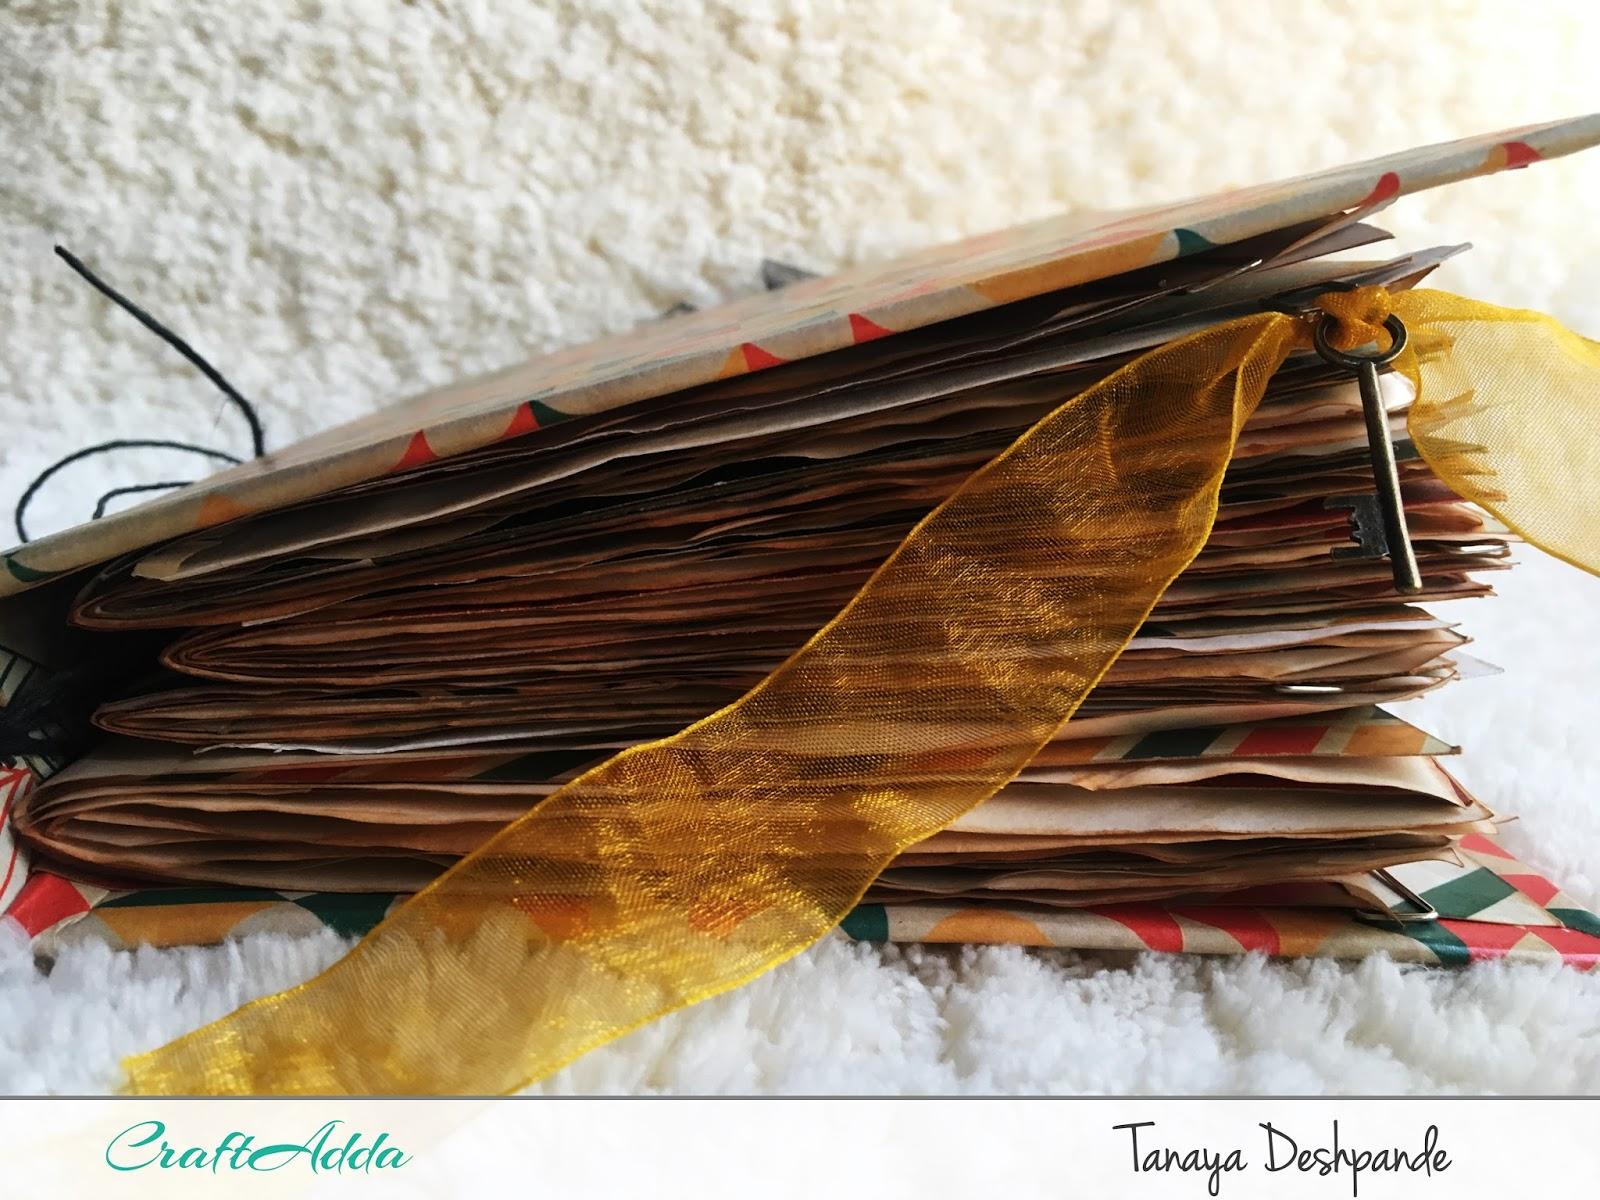 'Autumn Harvest' Junk Journal by Tanaya 2